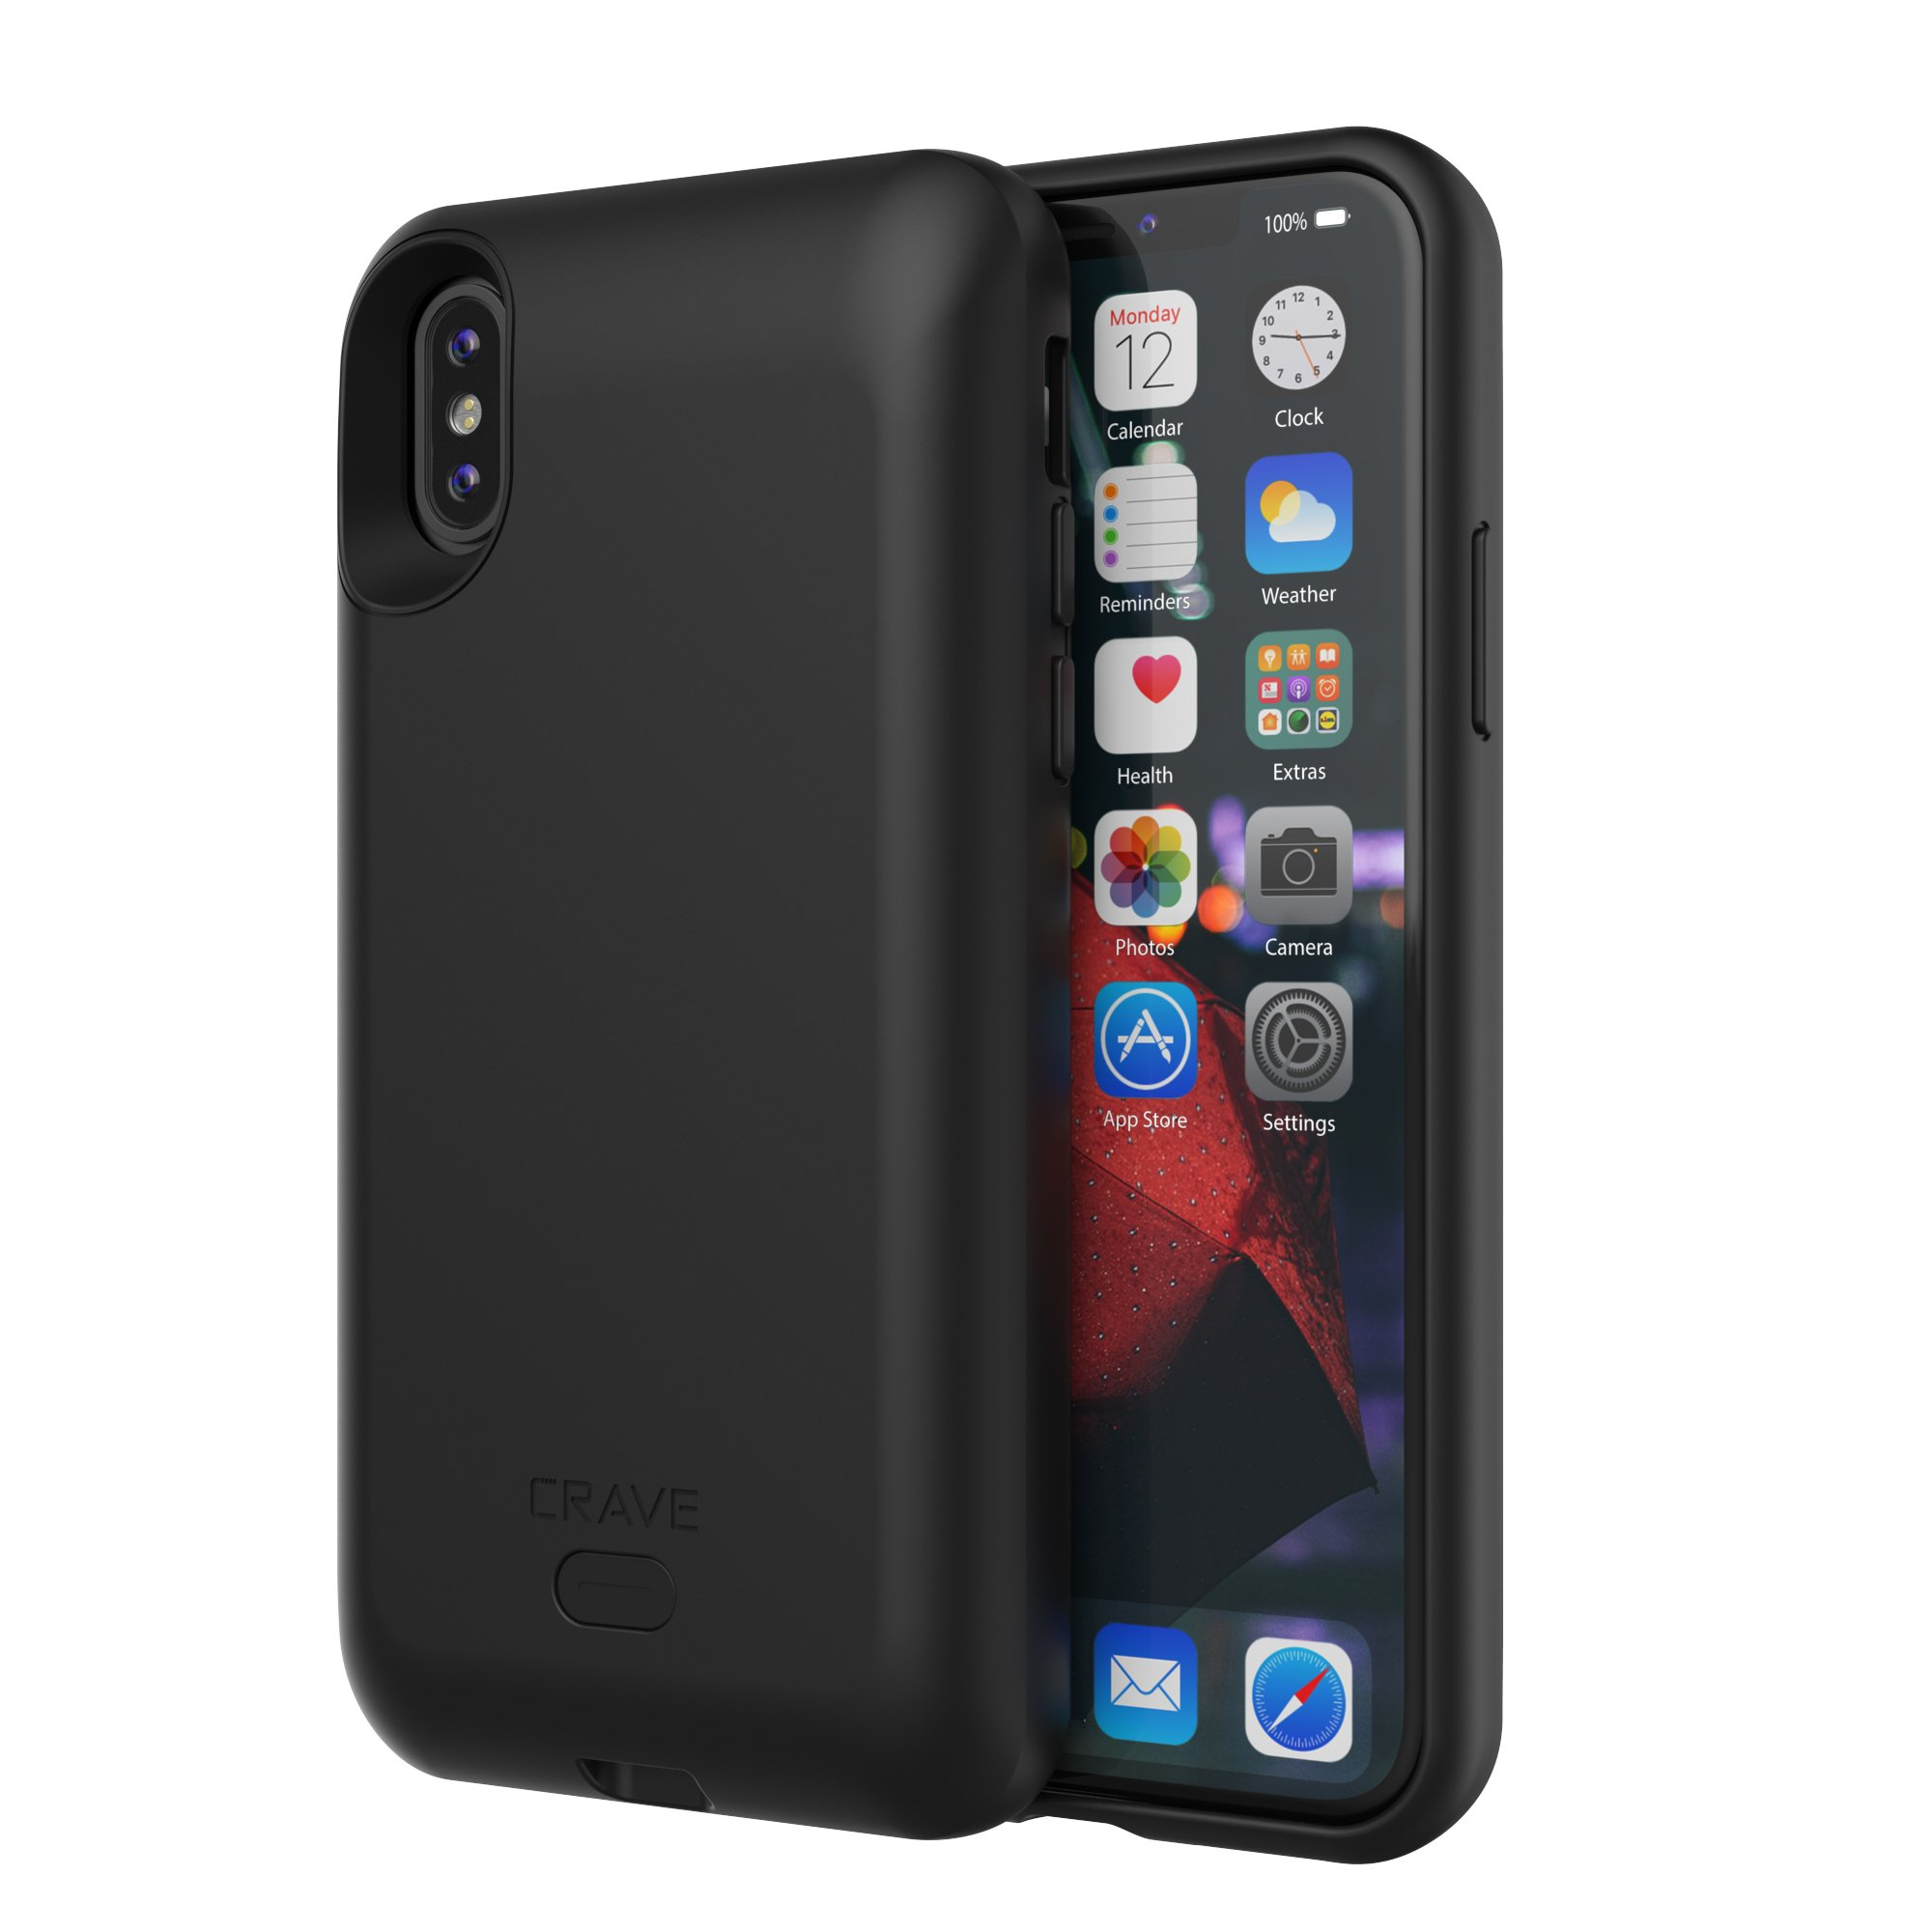 Funda Con Bateria de 3000mah para Apple Iphone X/Xs CRAVE [78TH92PP]